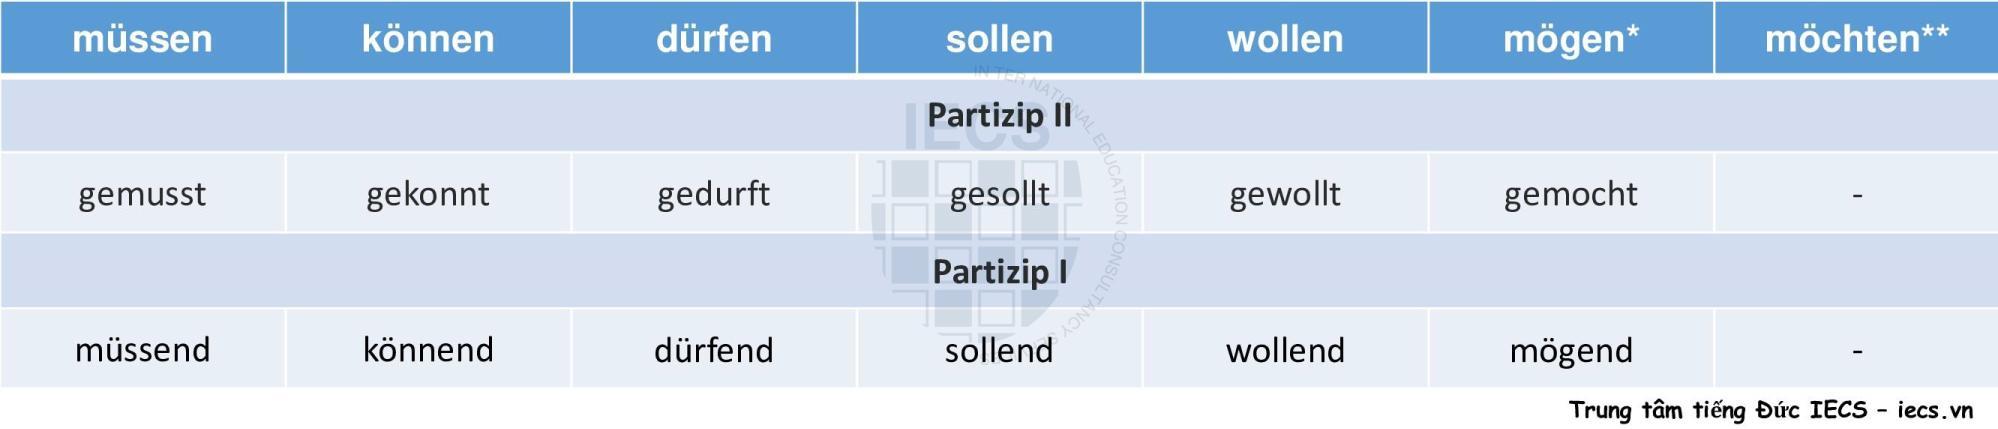 Modalverben-Partizip II và Partizip I